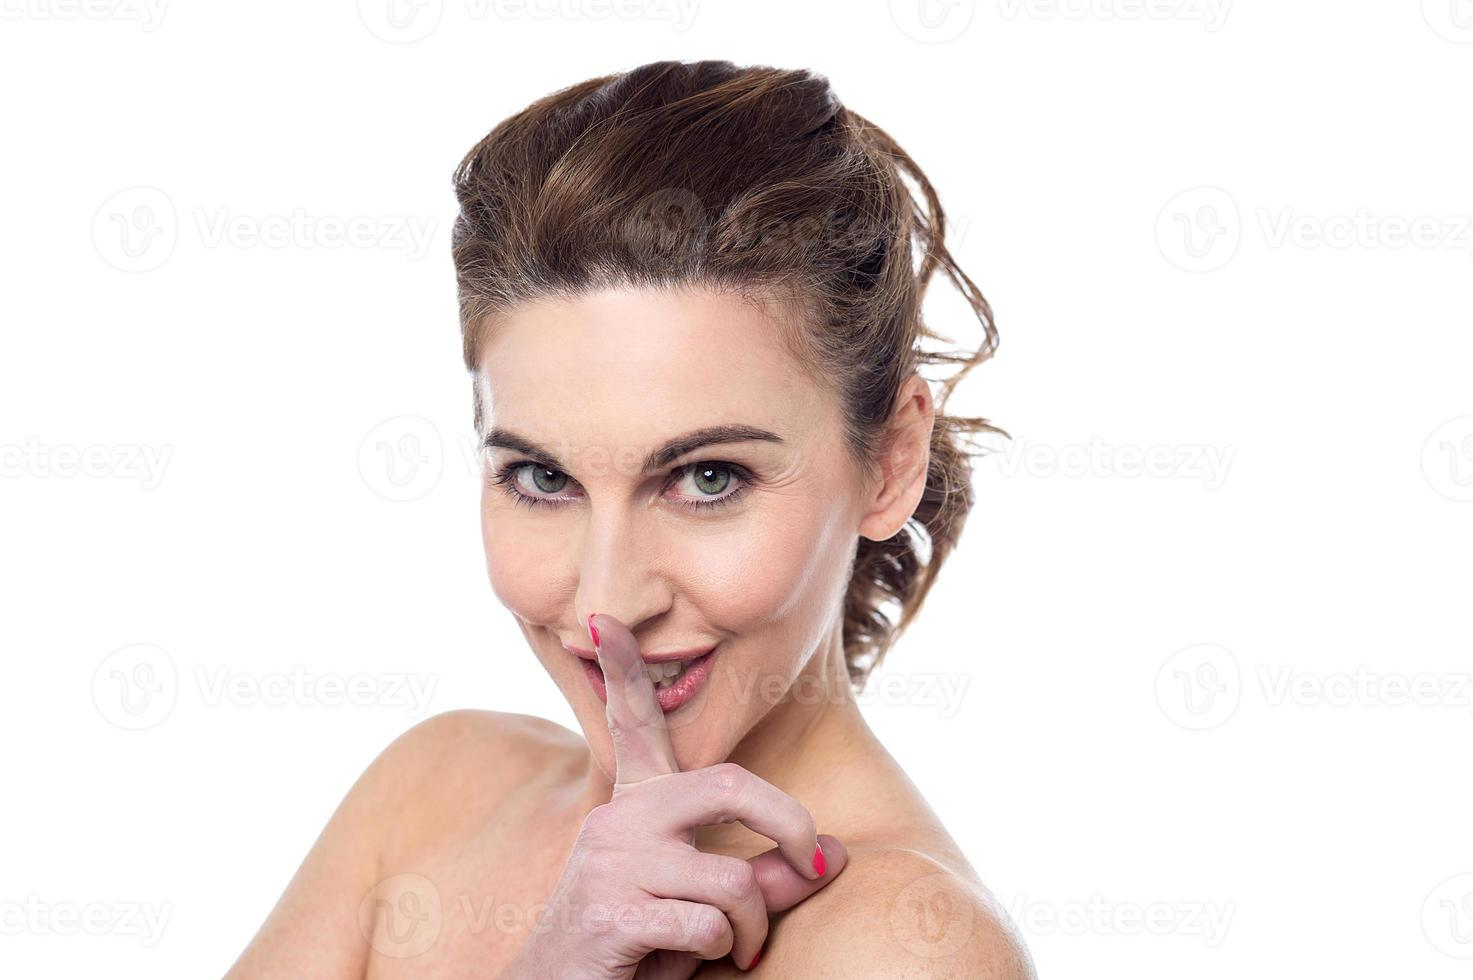 shhh, stilte alstublieft foto